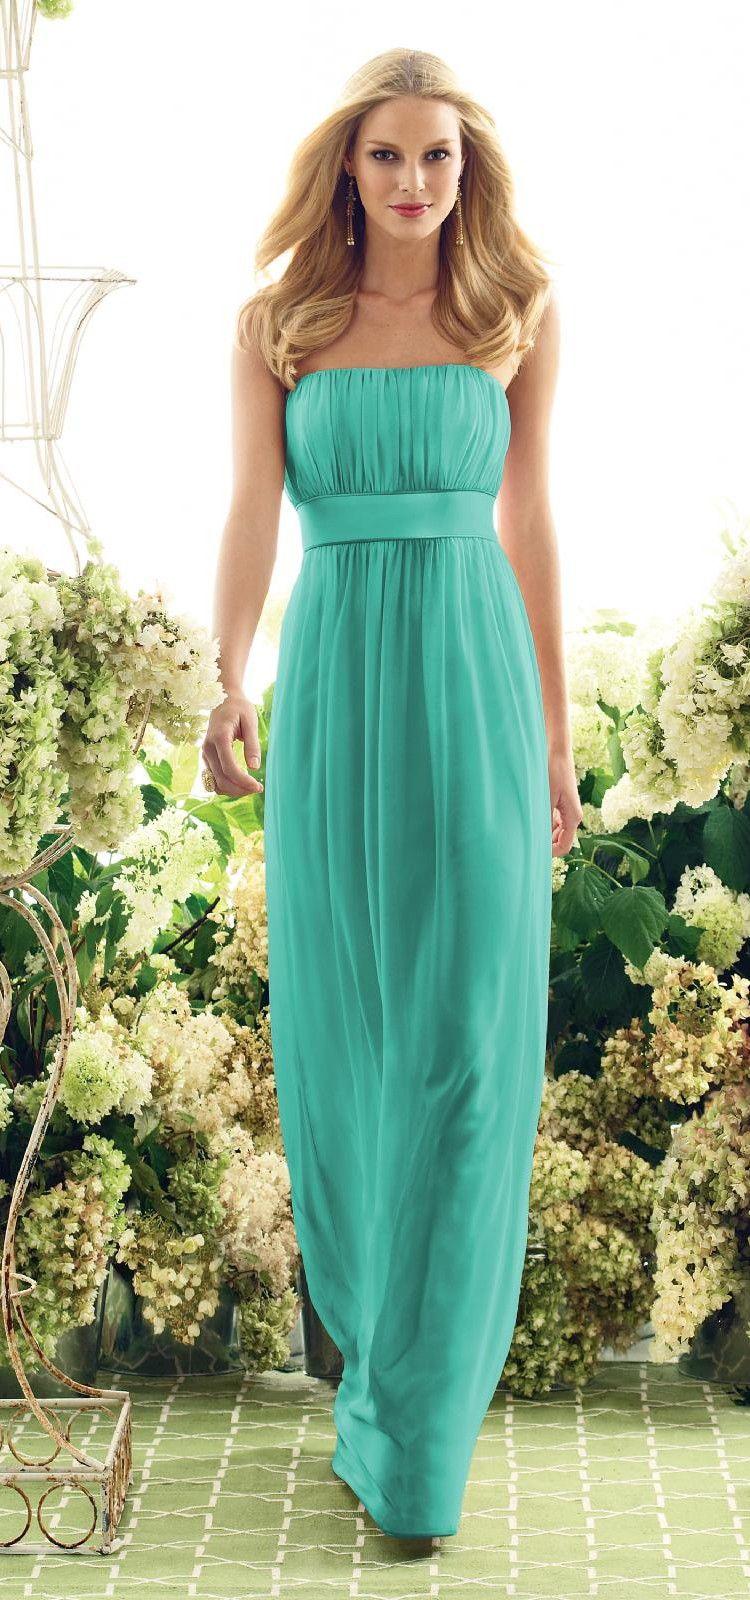 Turquoise wedding dresses  Turquoise bridesmaid dress  Party Planning Ideas  Pinterest